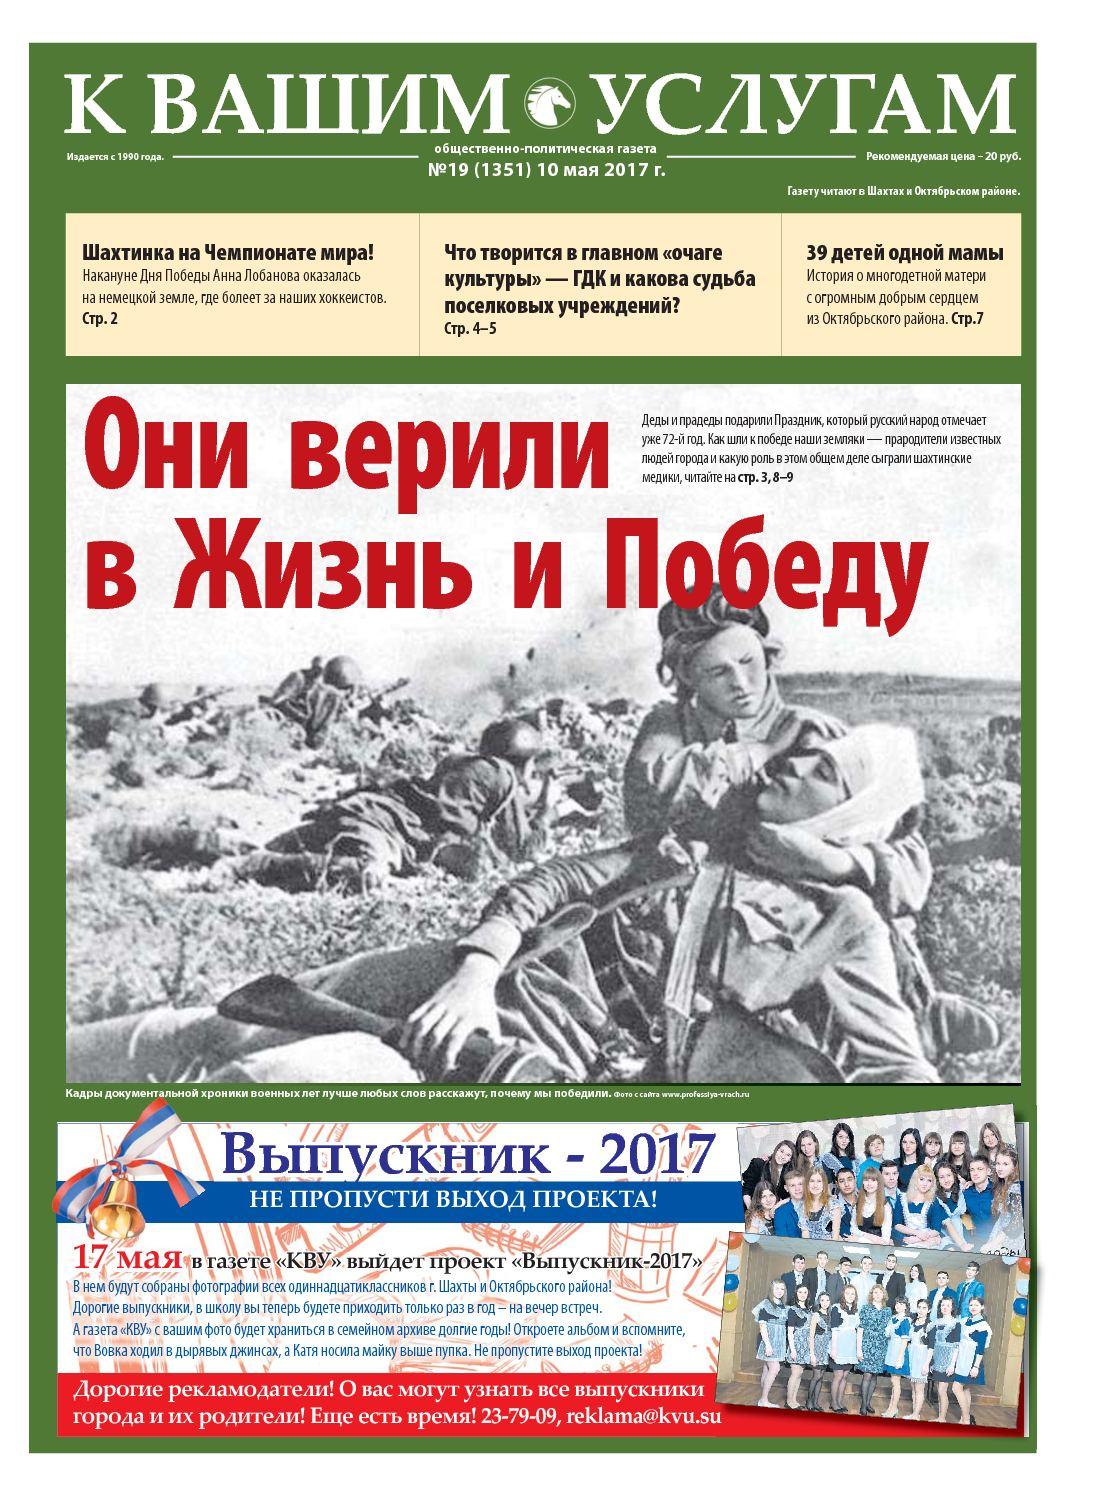 Calaméo - ГАЗЕТА КВУ №19 ОТ 10 МАЯ 2017 Г. edae945abd5